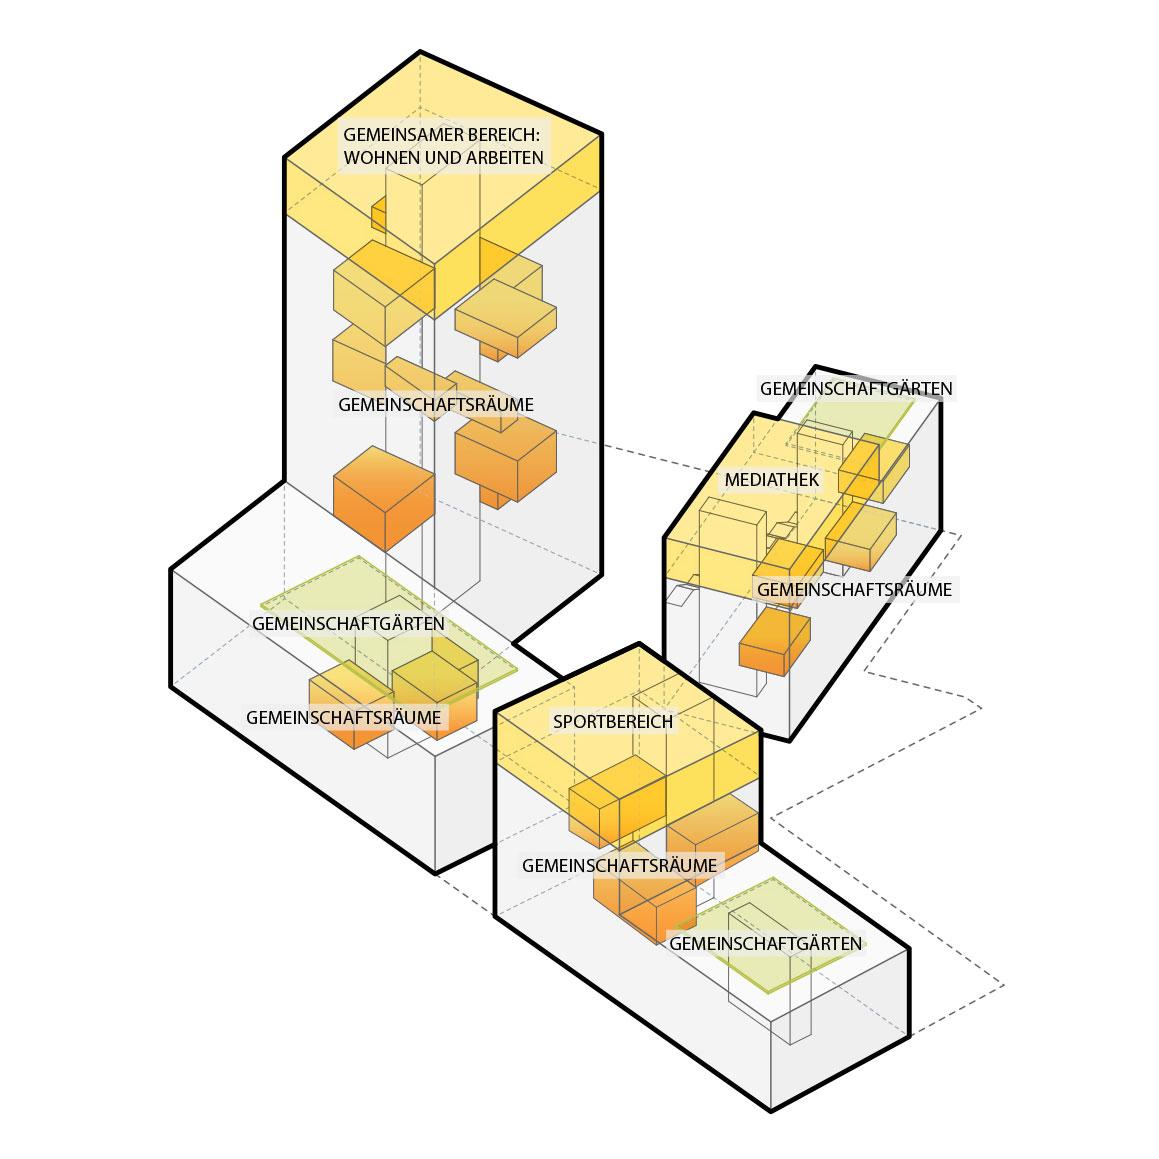 Postareal Böblingen: Diverse spaces for living together (Credits: Gutiérrez - De la Fuente Arquitectos / UTA Architekten und Stadtplaner)